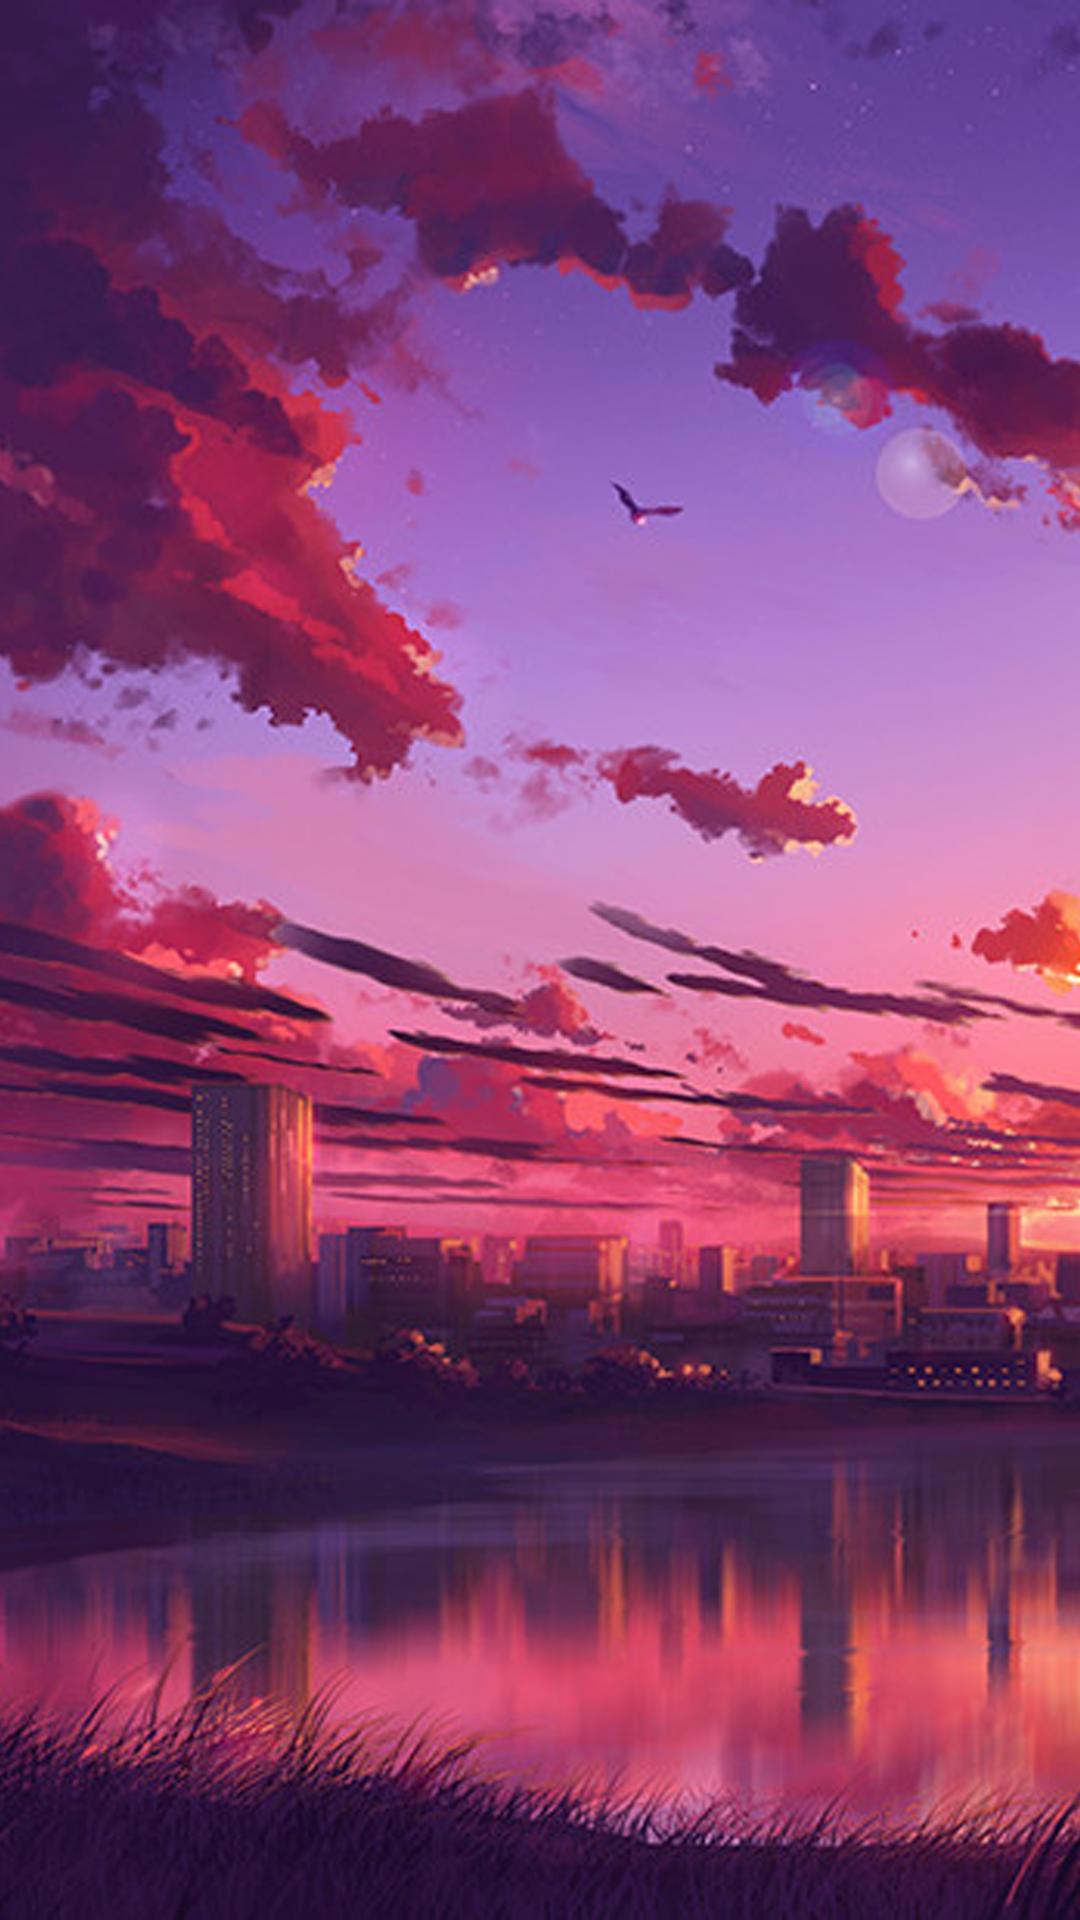 Hd Phone Wallpaper 1080x1920 Hd Phone Wallpapers Anime Scenery Wallpaper Anime Scenery